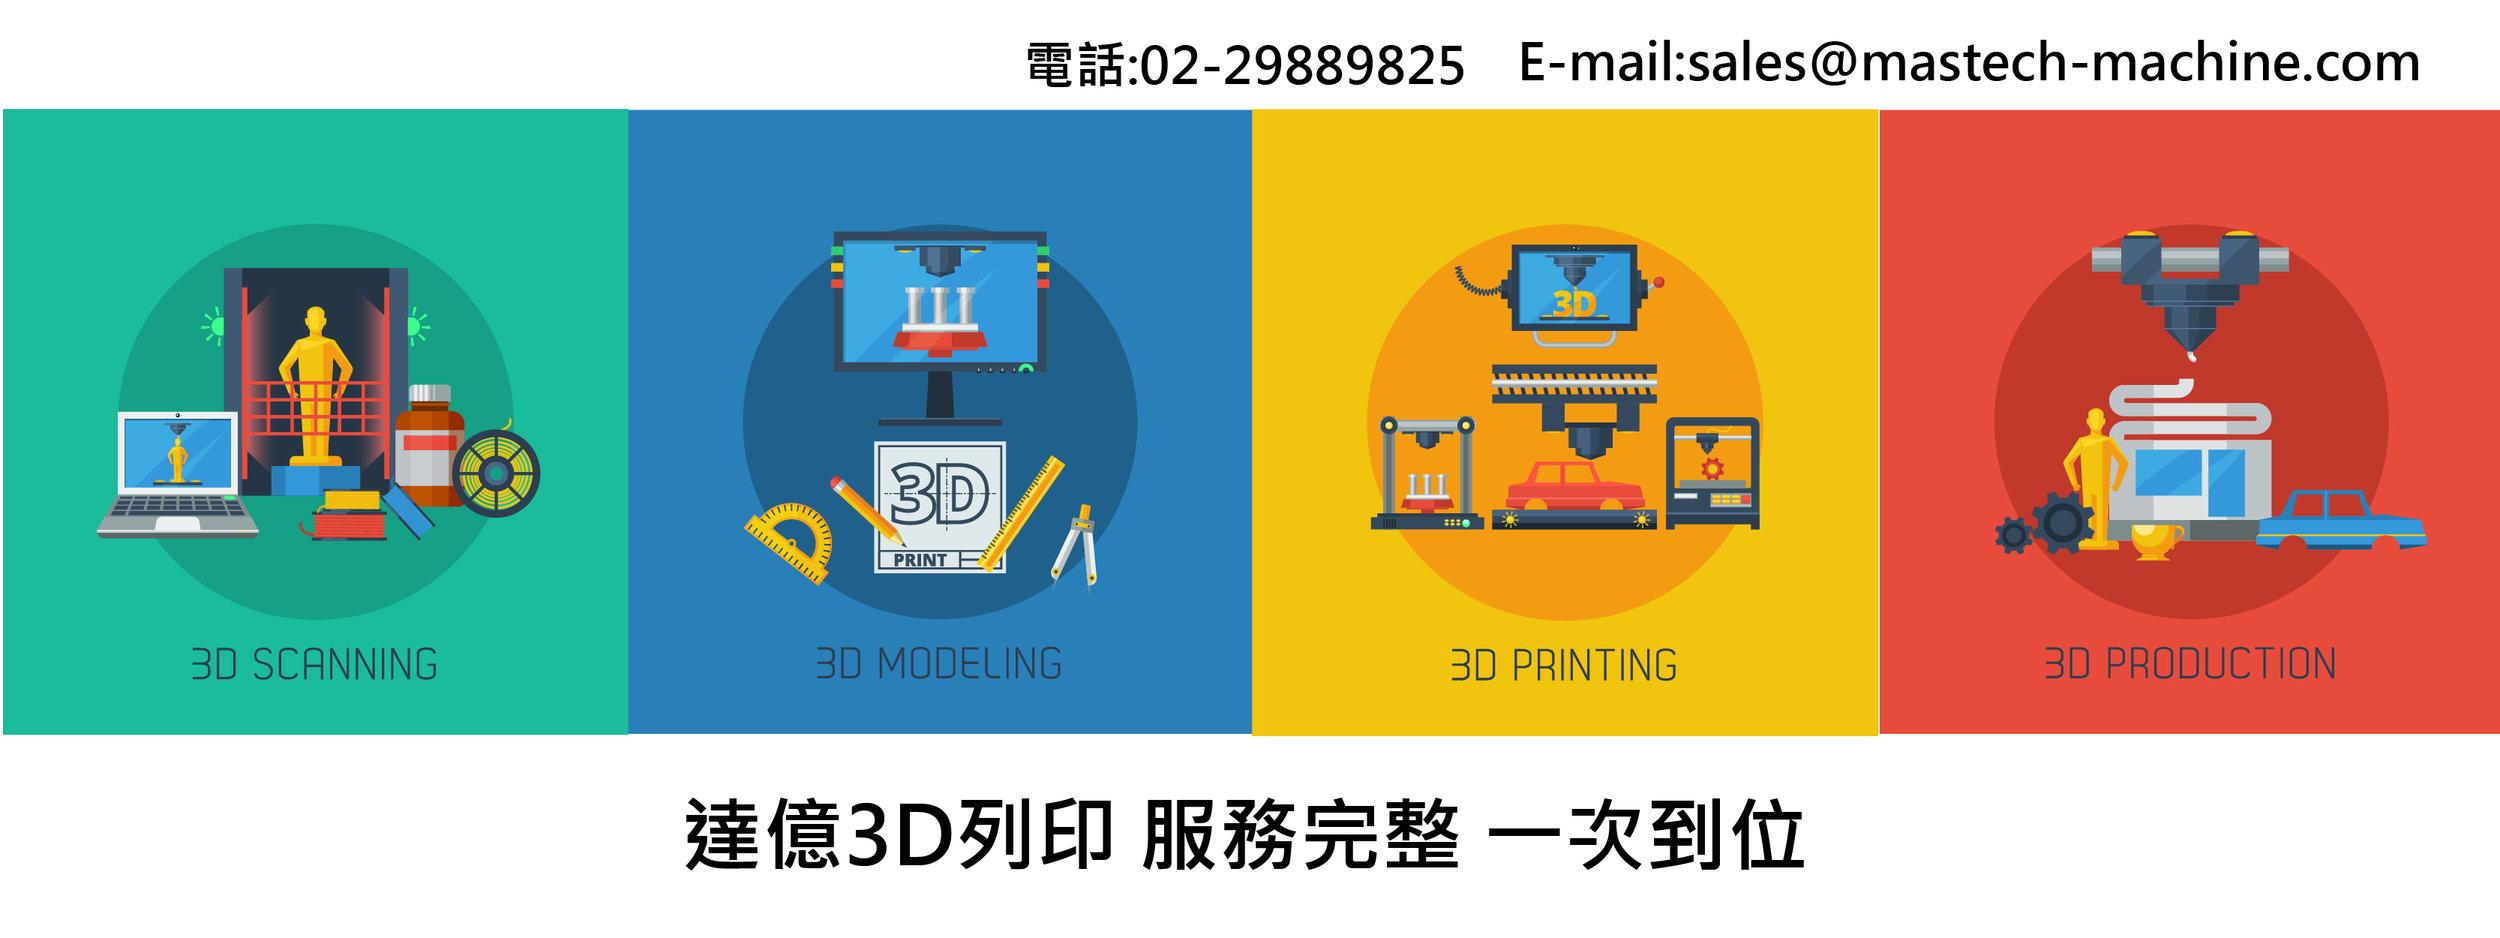 banner-fb-3d列印示意圖-01.jpg